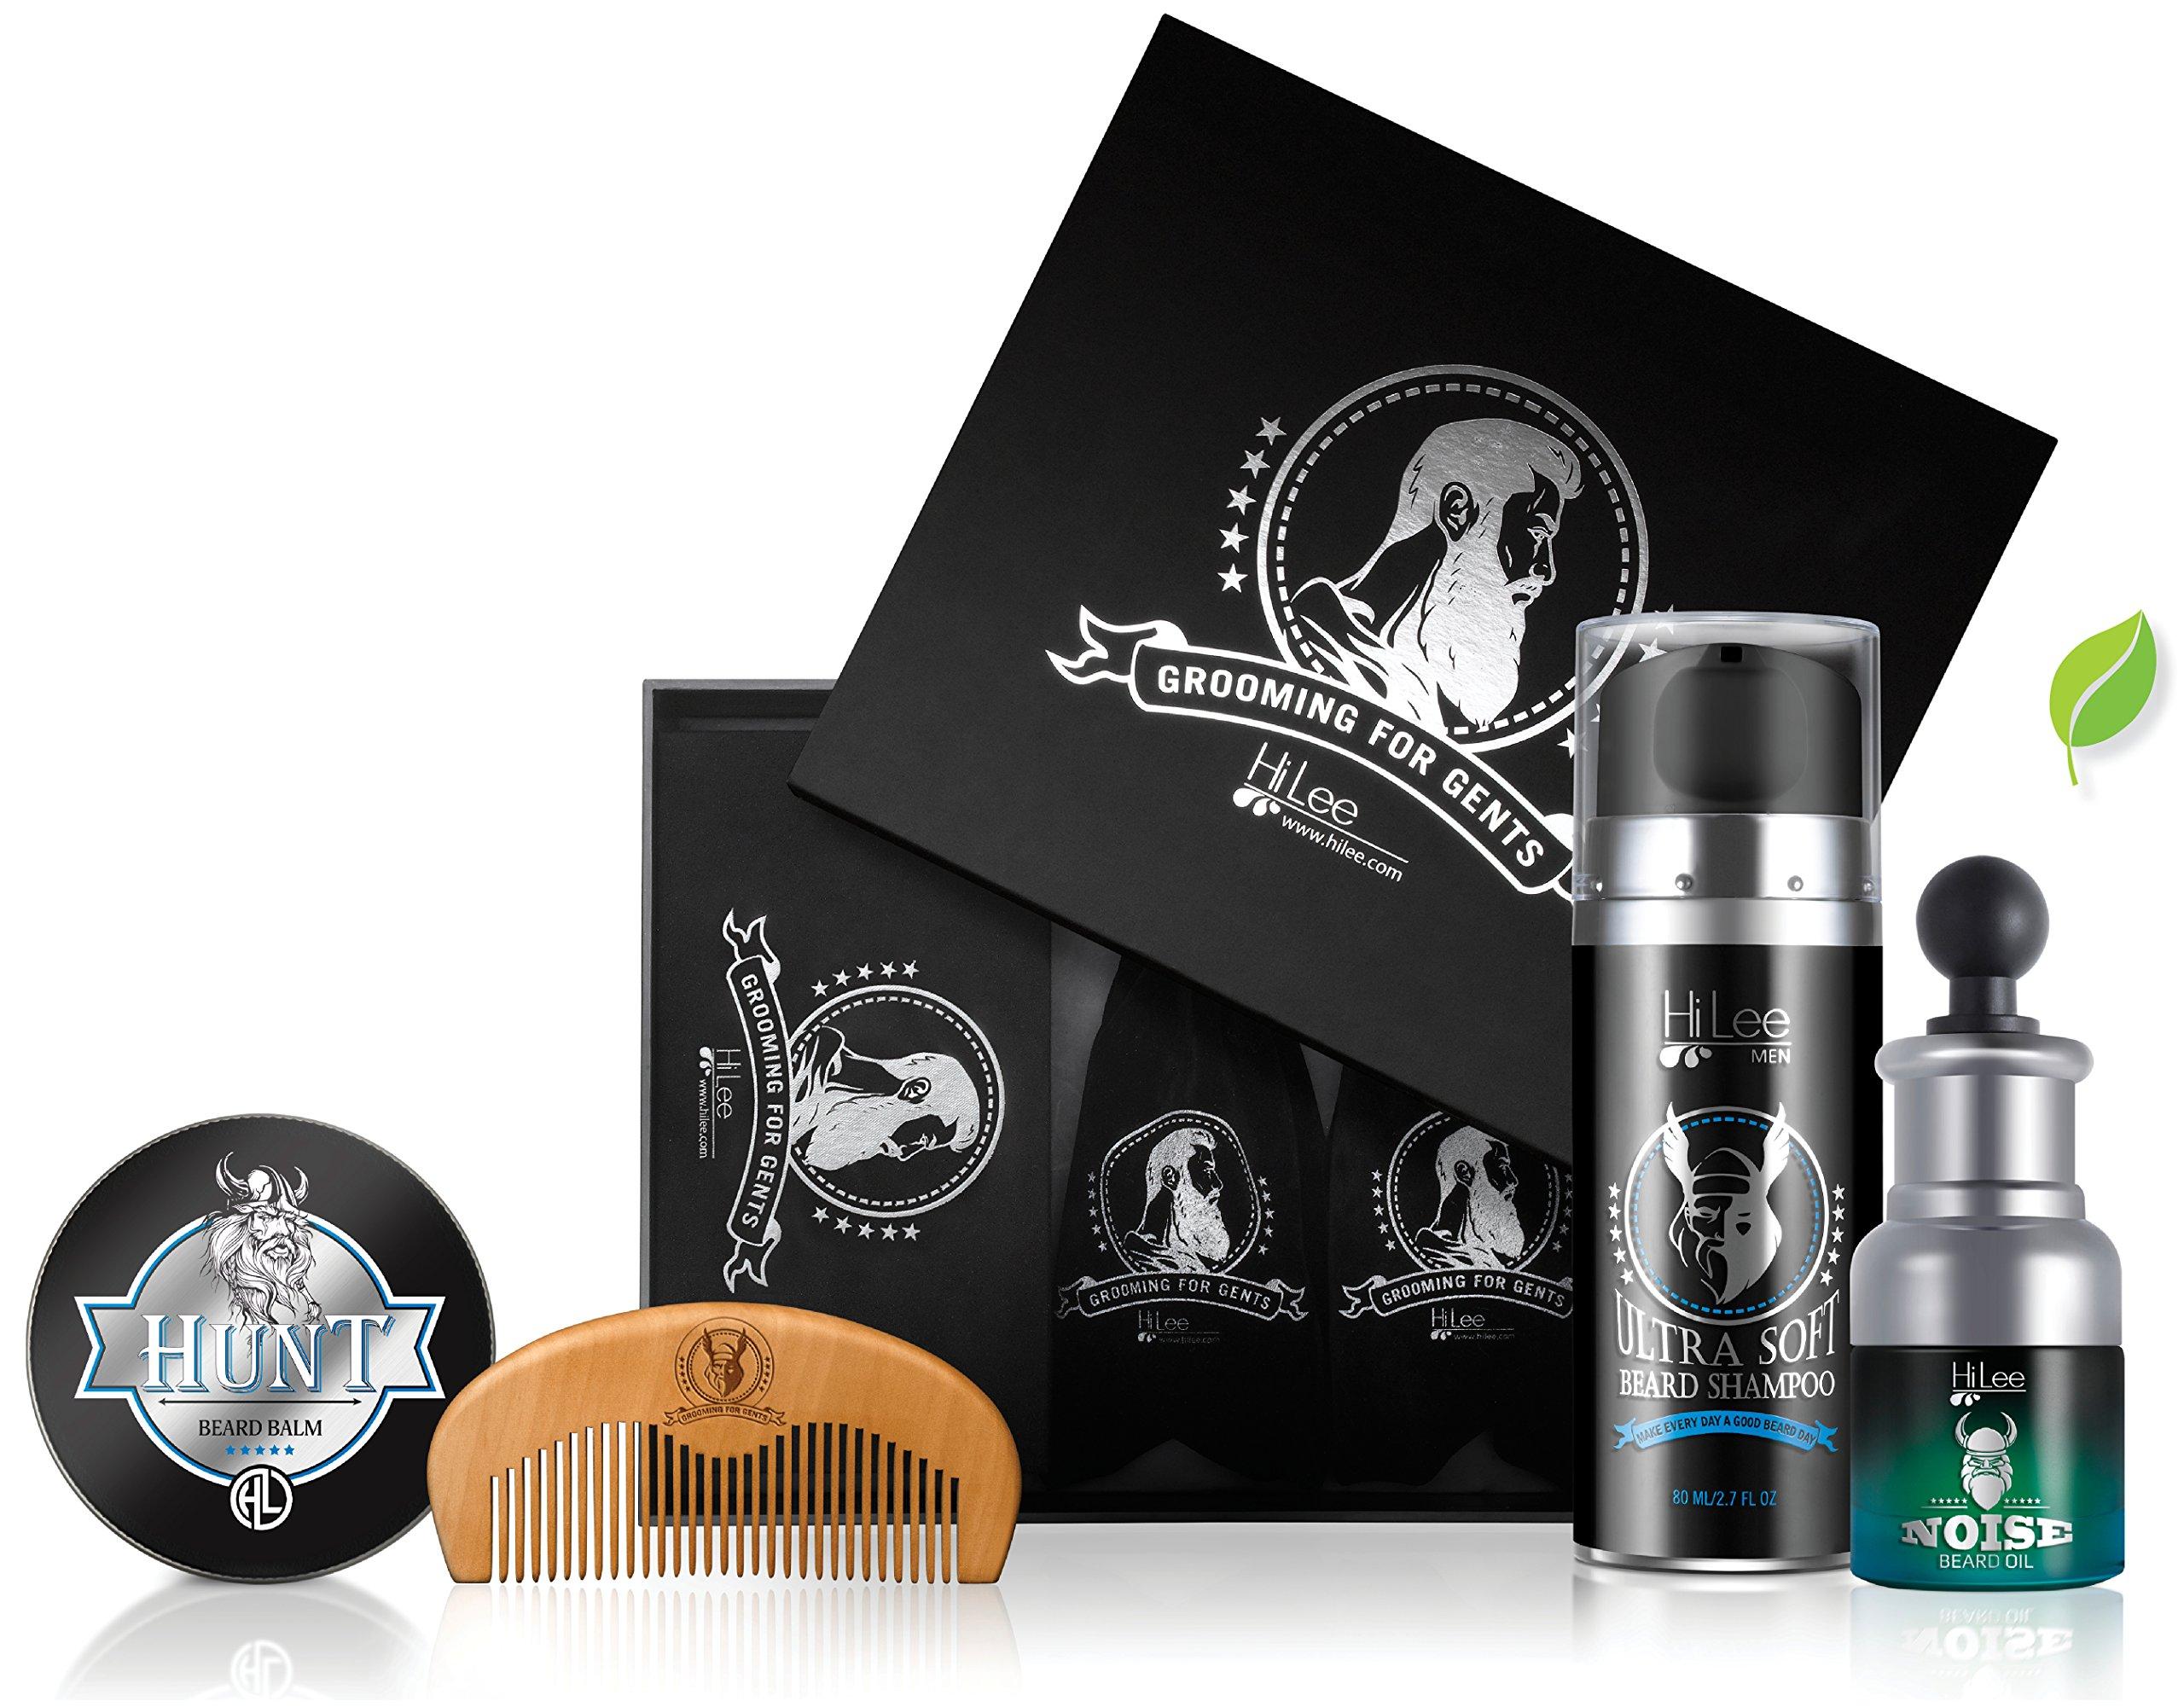 Cool Beard Grooming Kit Contains - Beard Balm, Beard Oil, Beard Shampoo Ultra Soft, Beard comb, Gift Packaging.